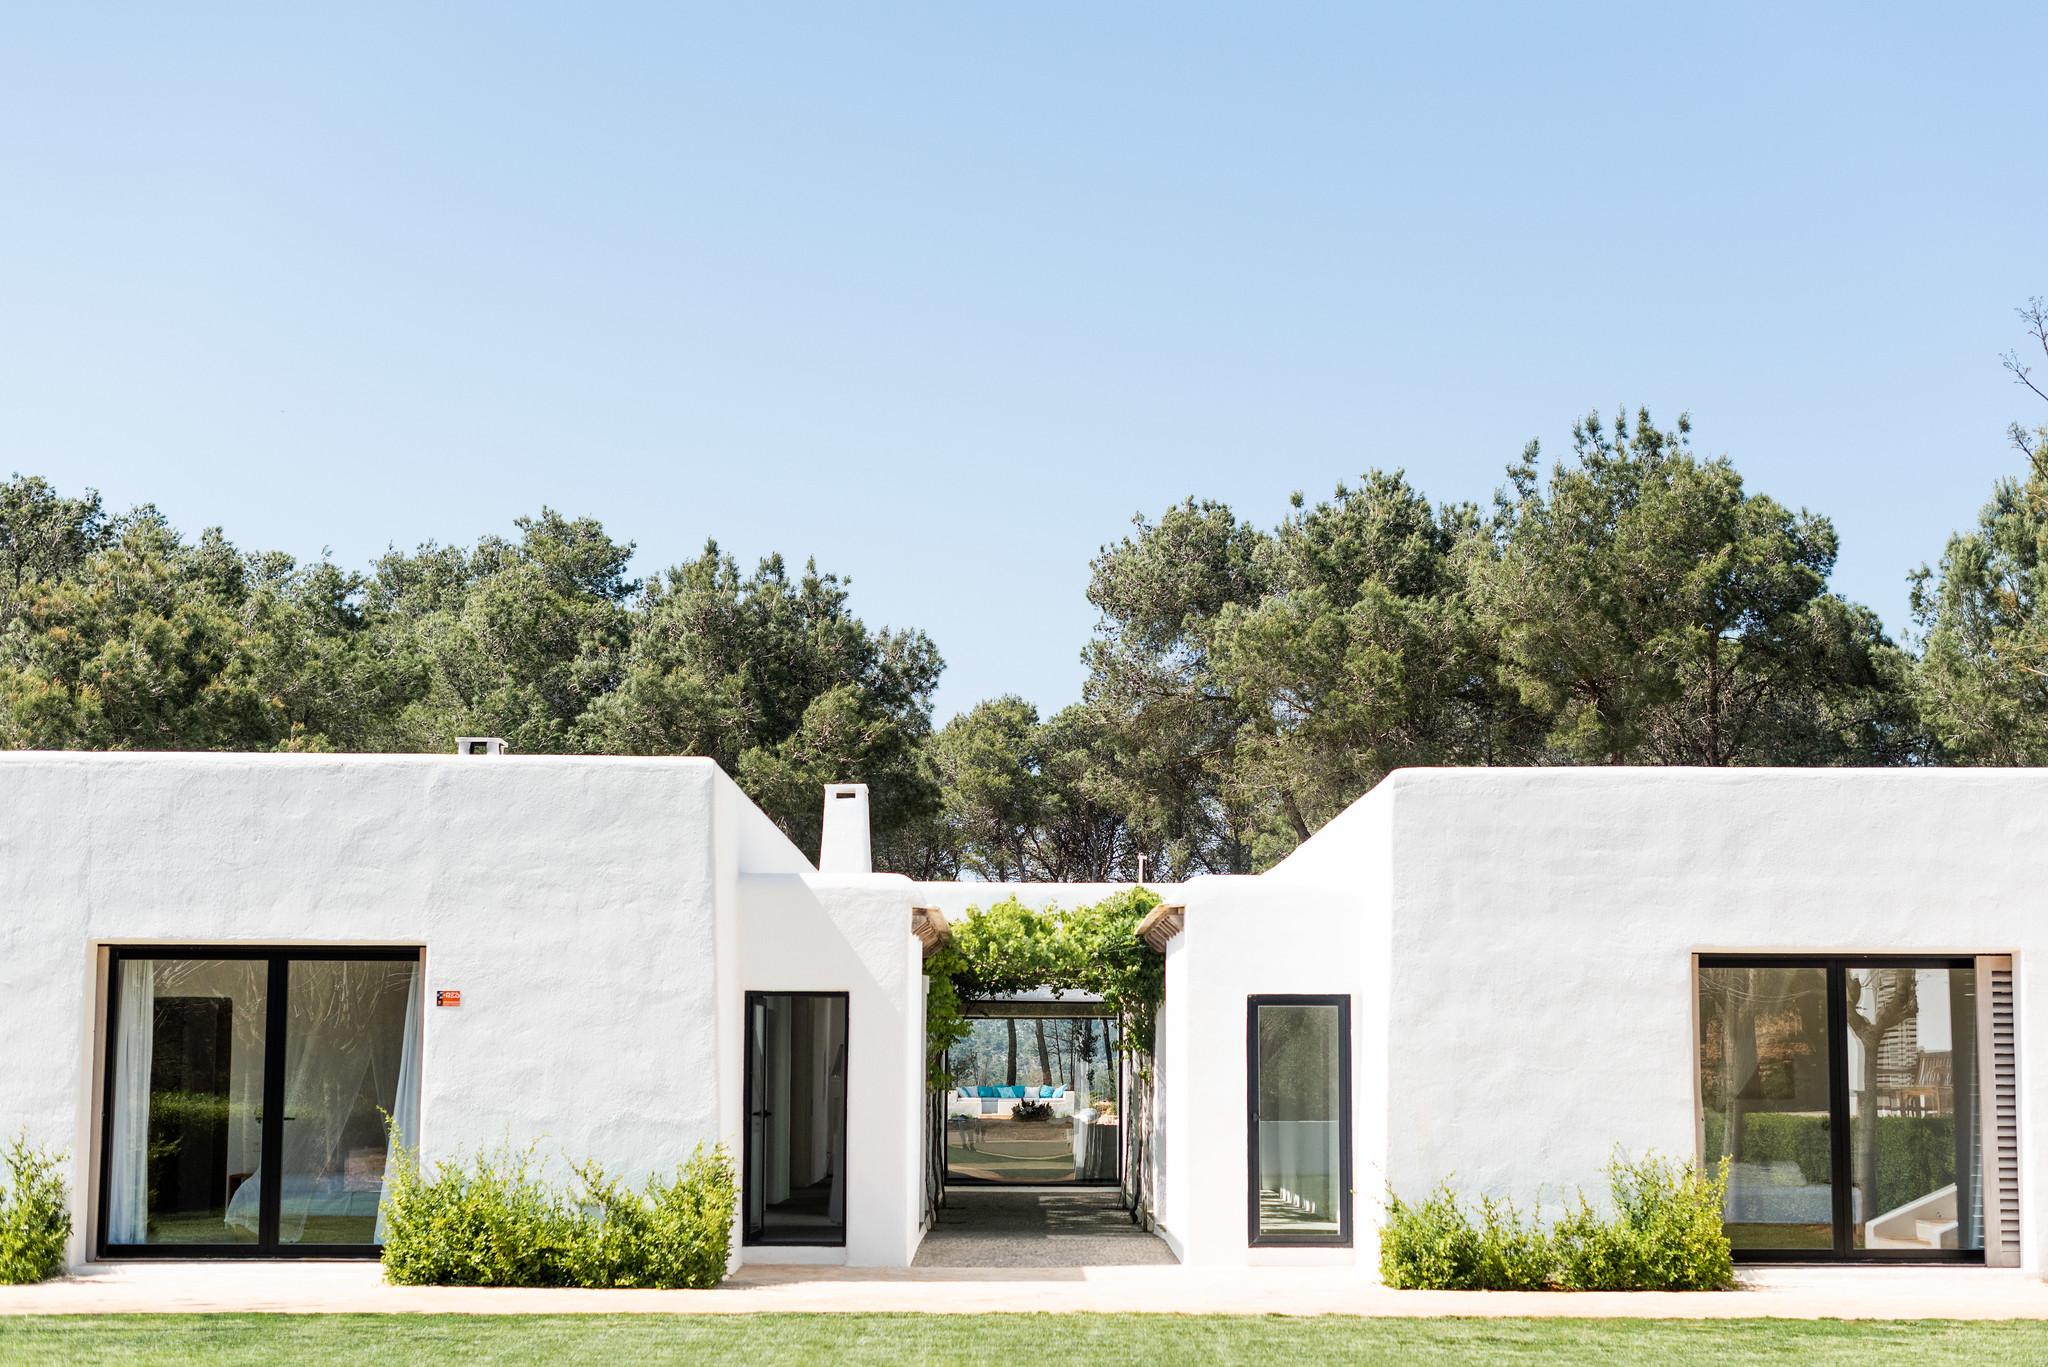 https://www.white-ibiza.com/wp-content/uploads/2020/05/white-ibiza-villas-can-terra-back-of-house.jpg